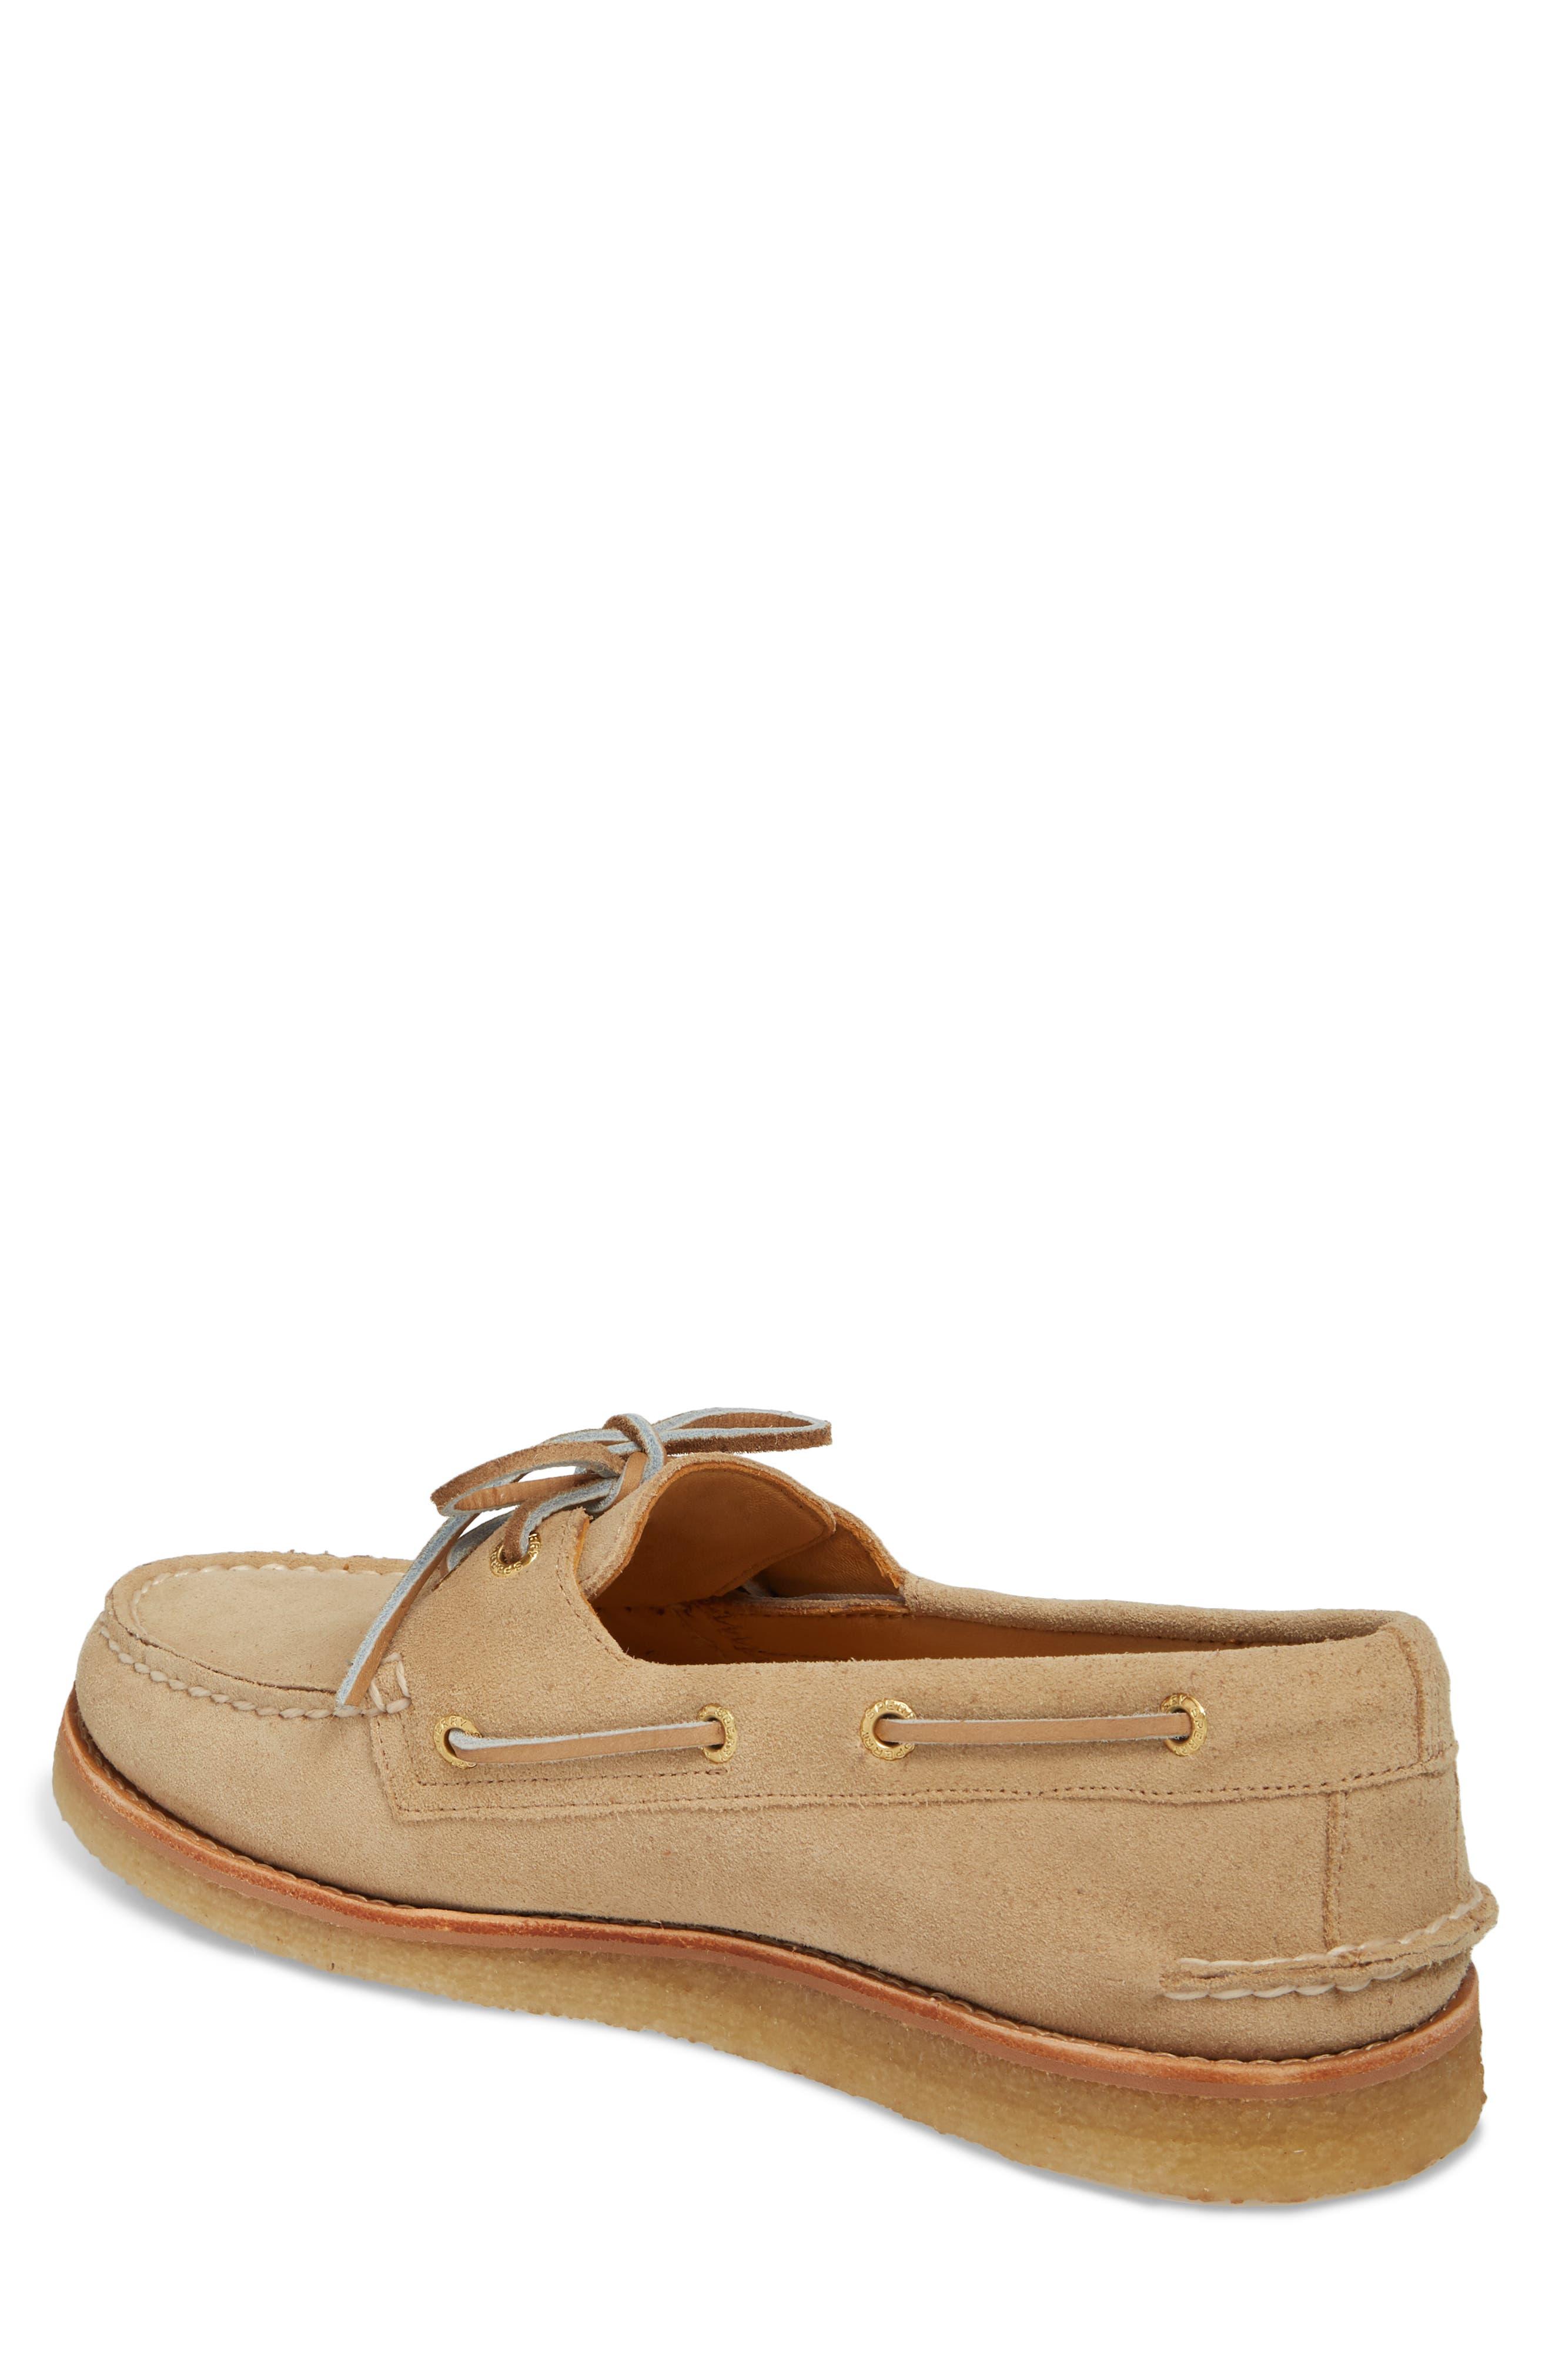 Alternate Image 2  - Sperry Gold Cup AO 2-Eye Boat Shoe (Men)